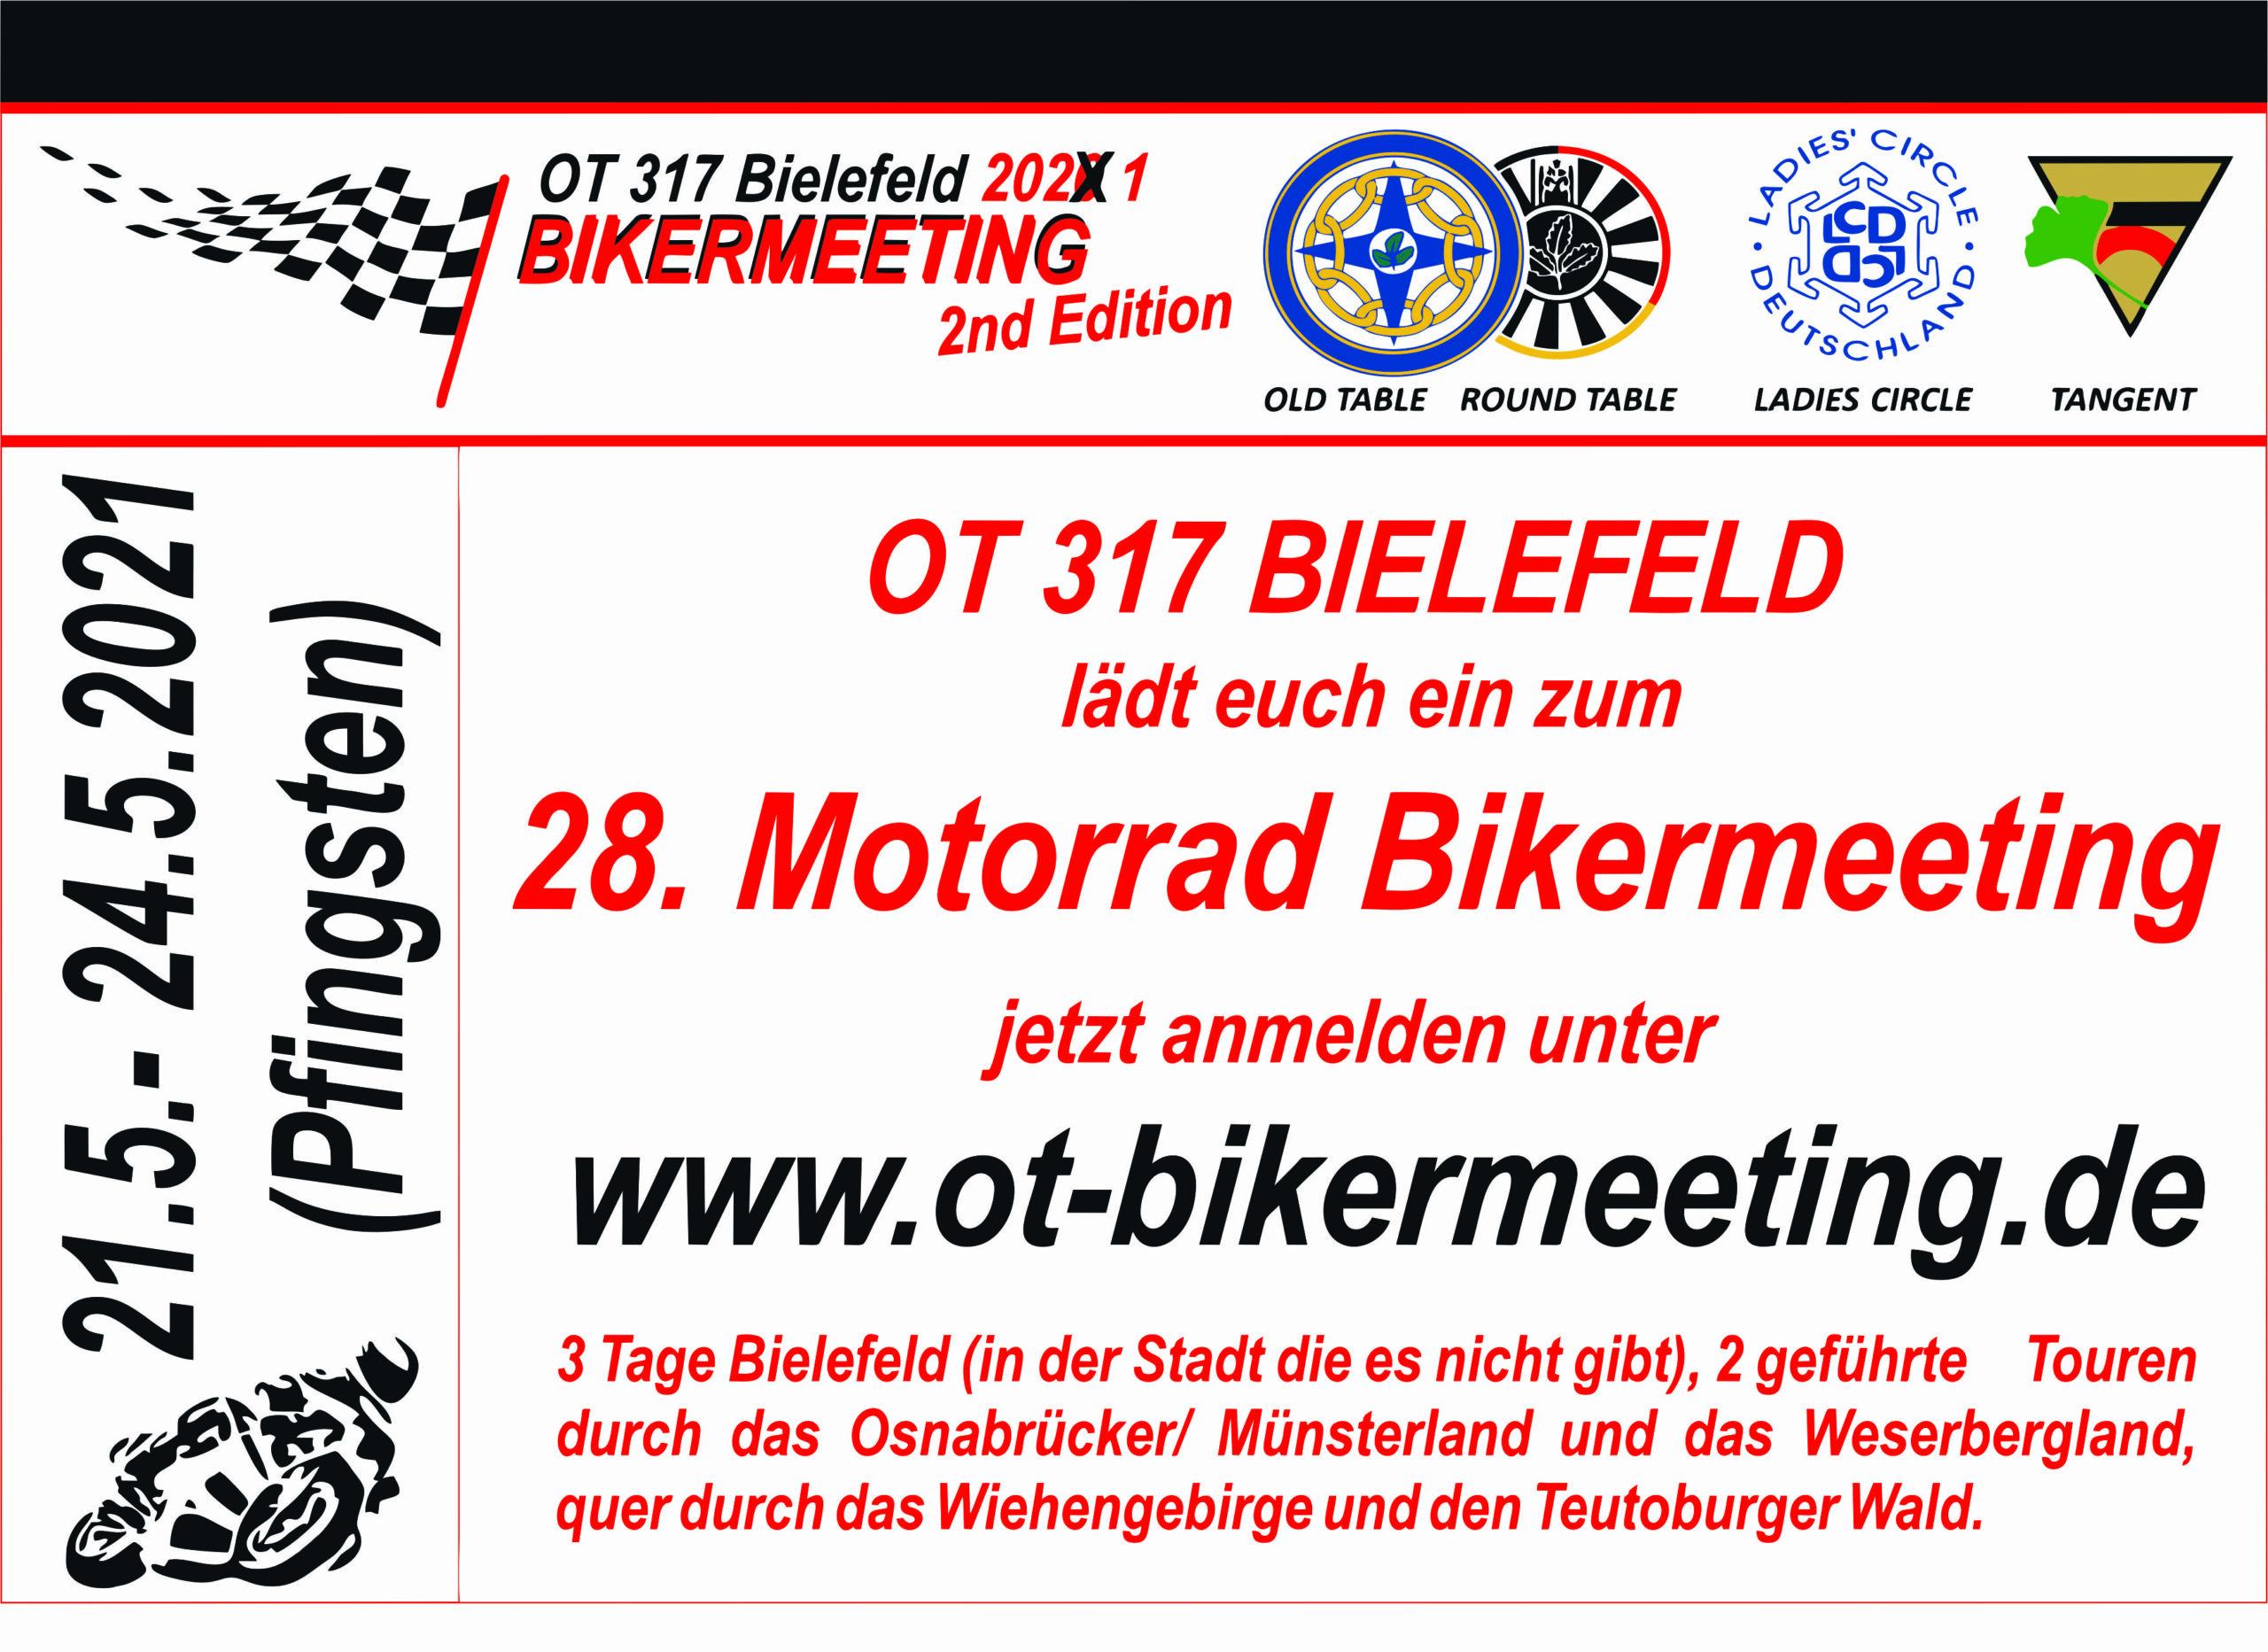 OT 317 BikerMeeting – 21.05. bis 24.05.2021